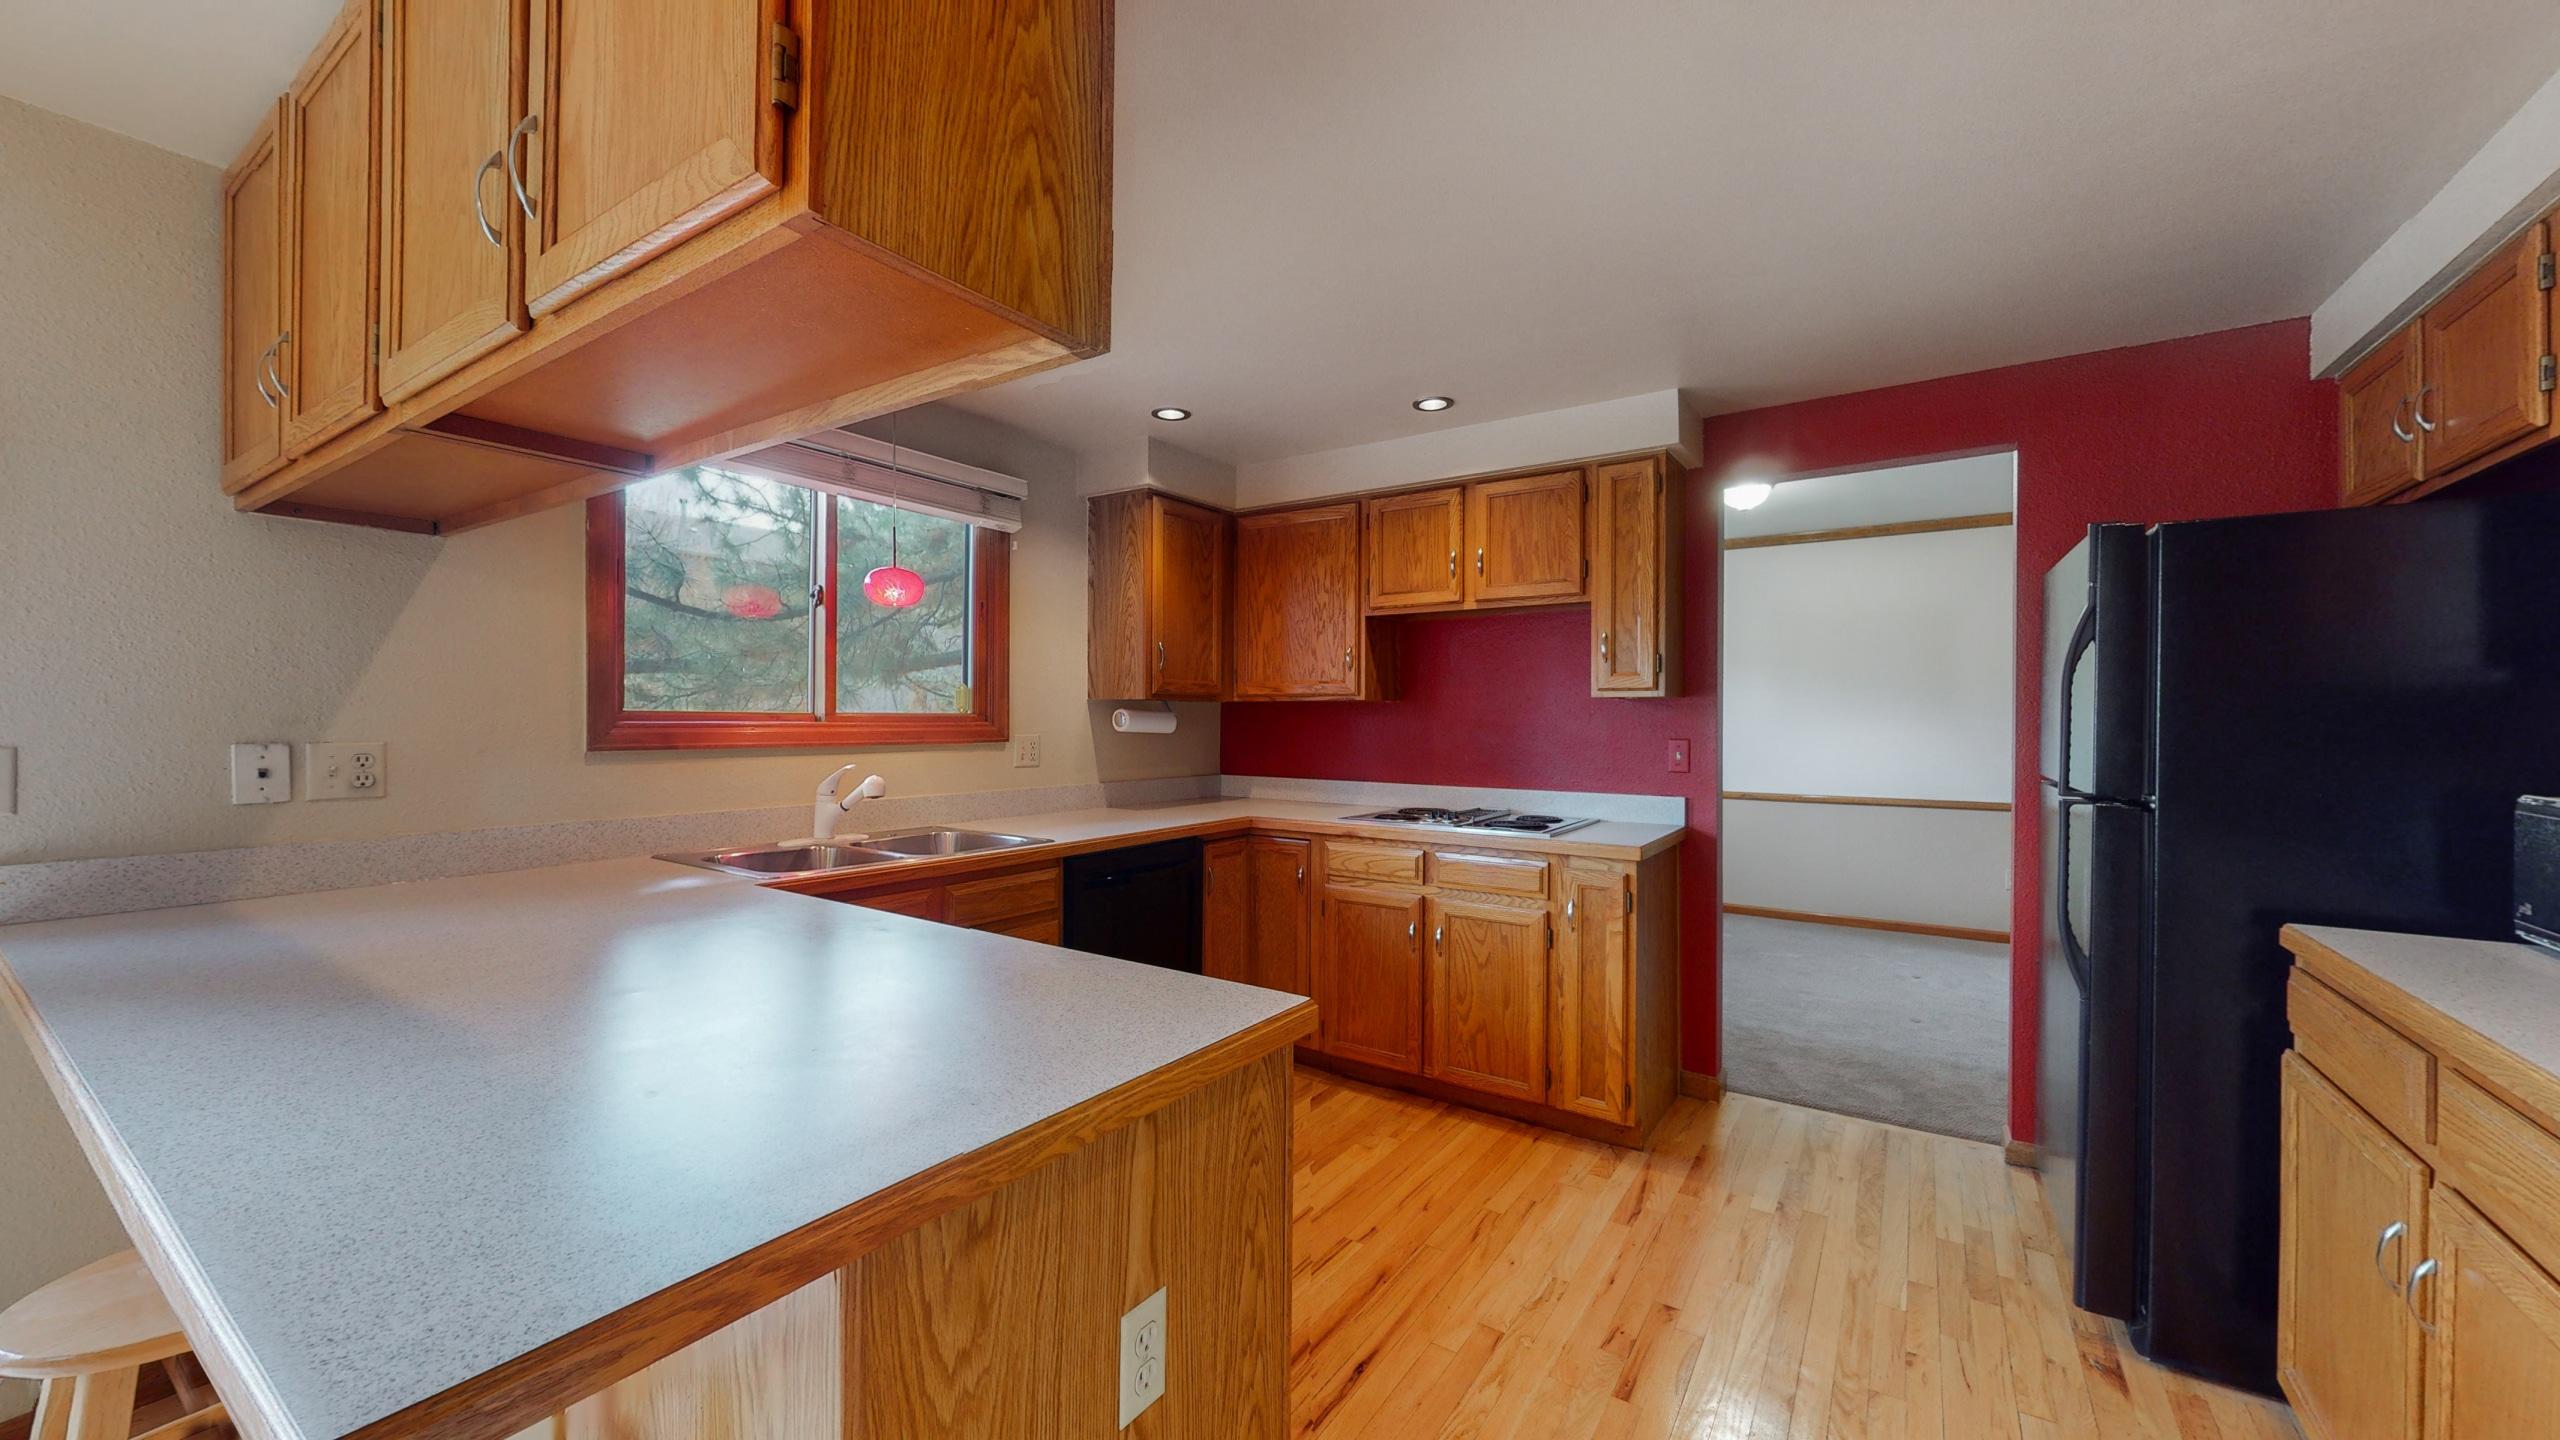 Kitchen with oak cabinets, hardwood floors, black appliances